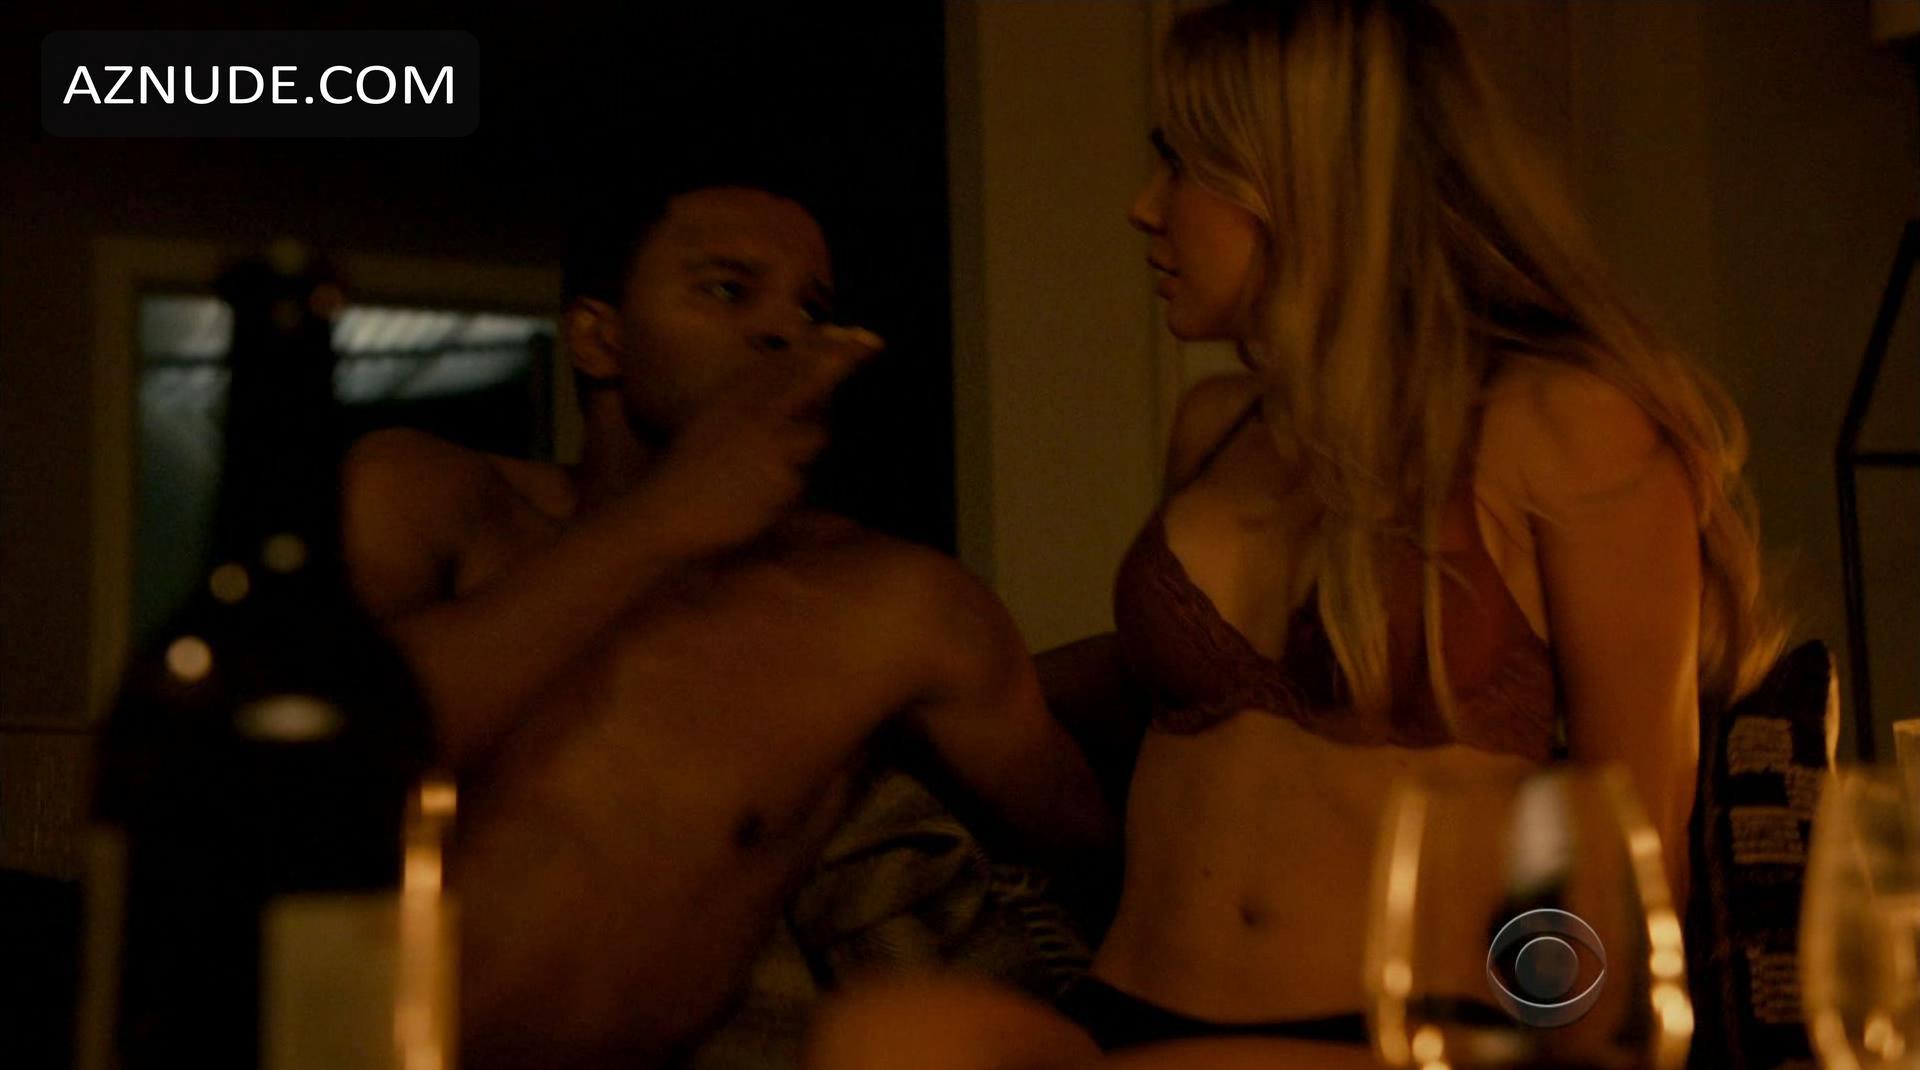 los angeles sex scene